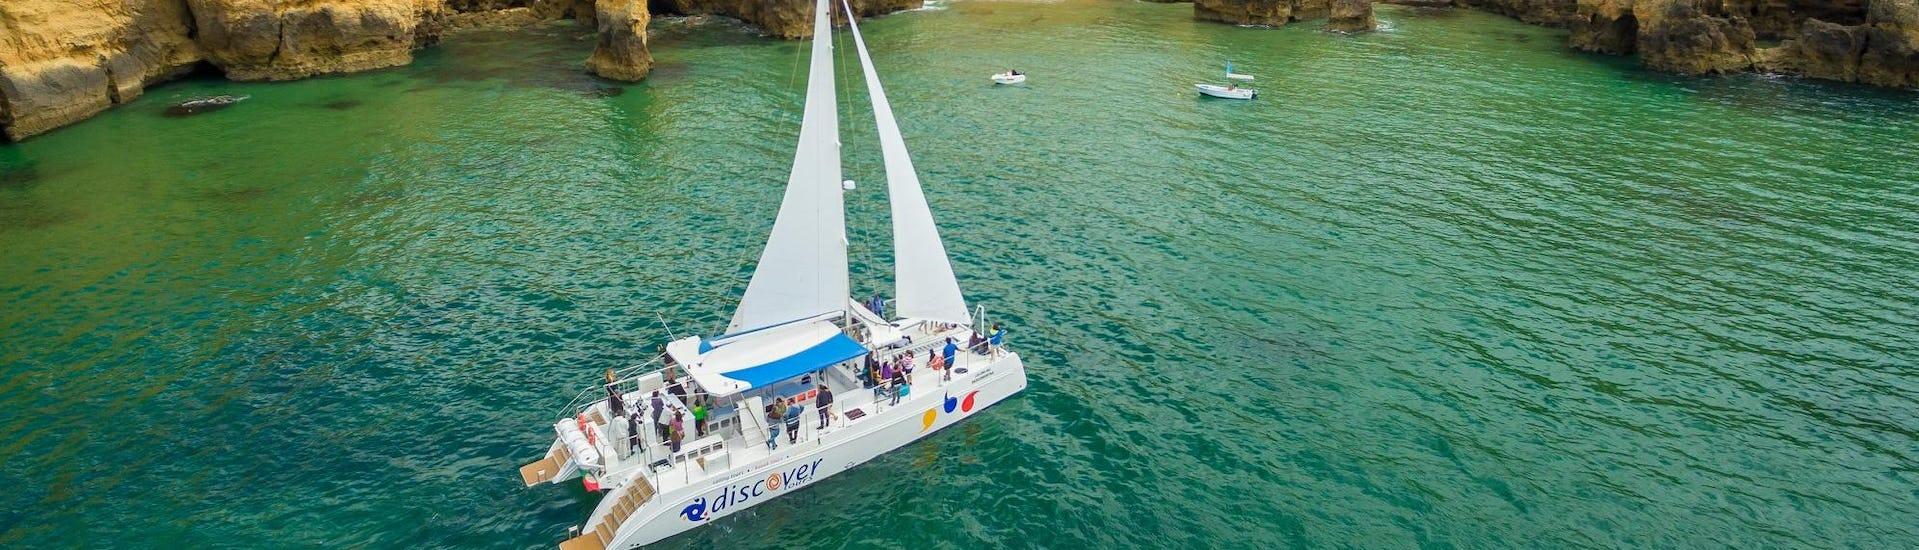 catamaran-tour-golden-coast-high-season-from-lagos-discover-tours-hero